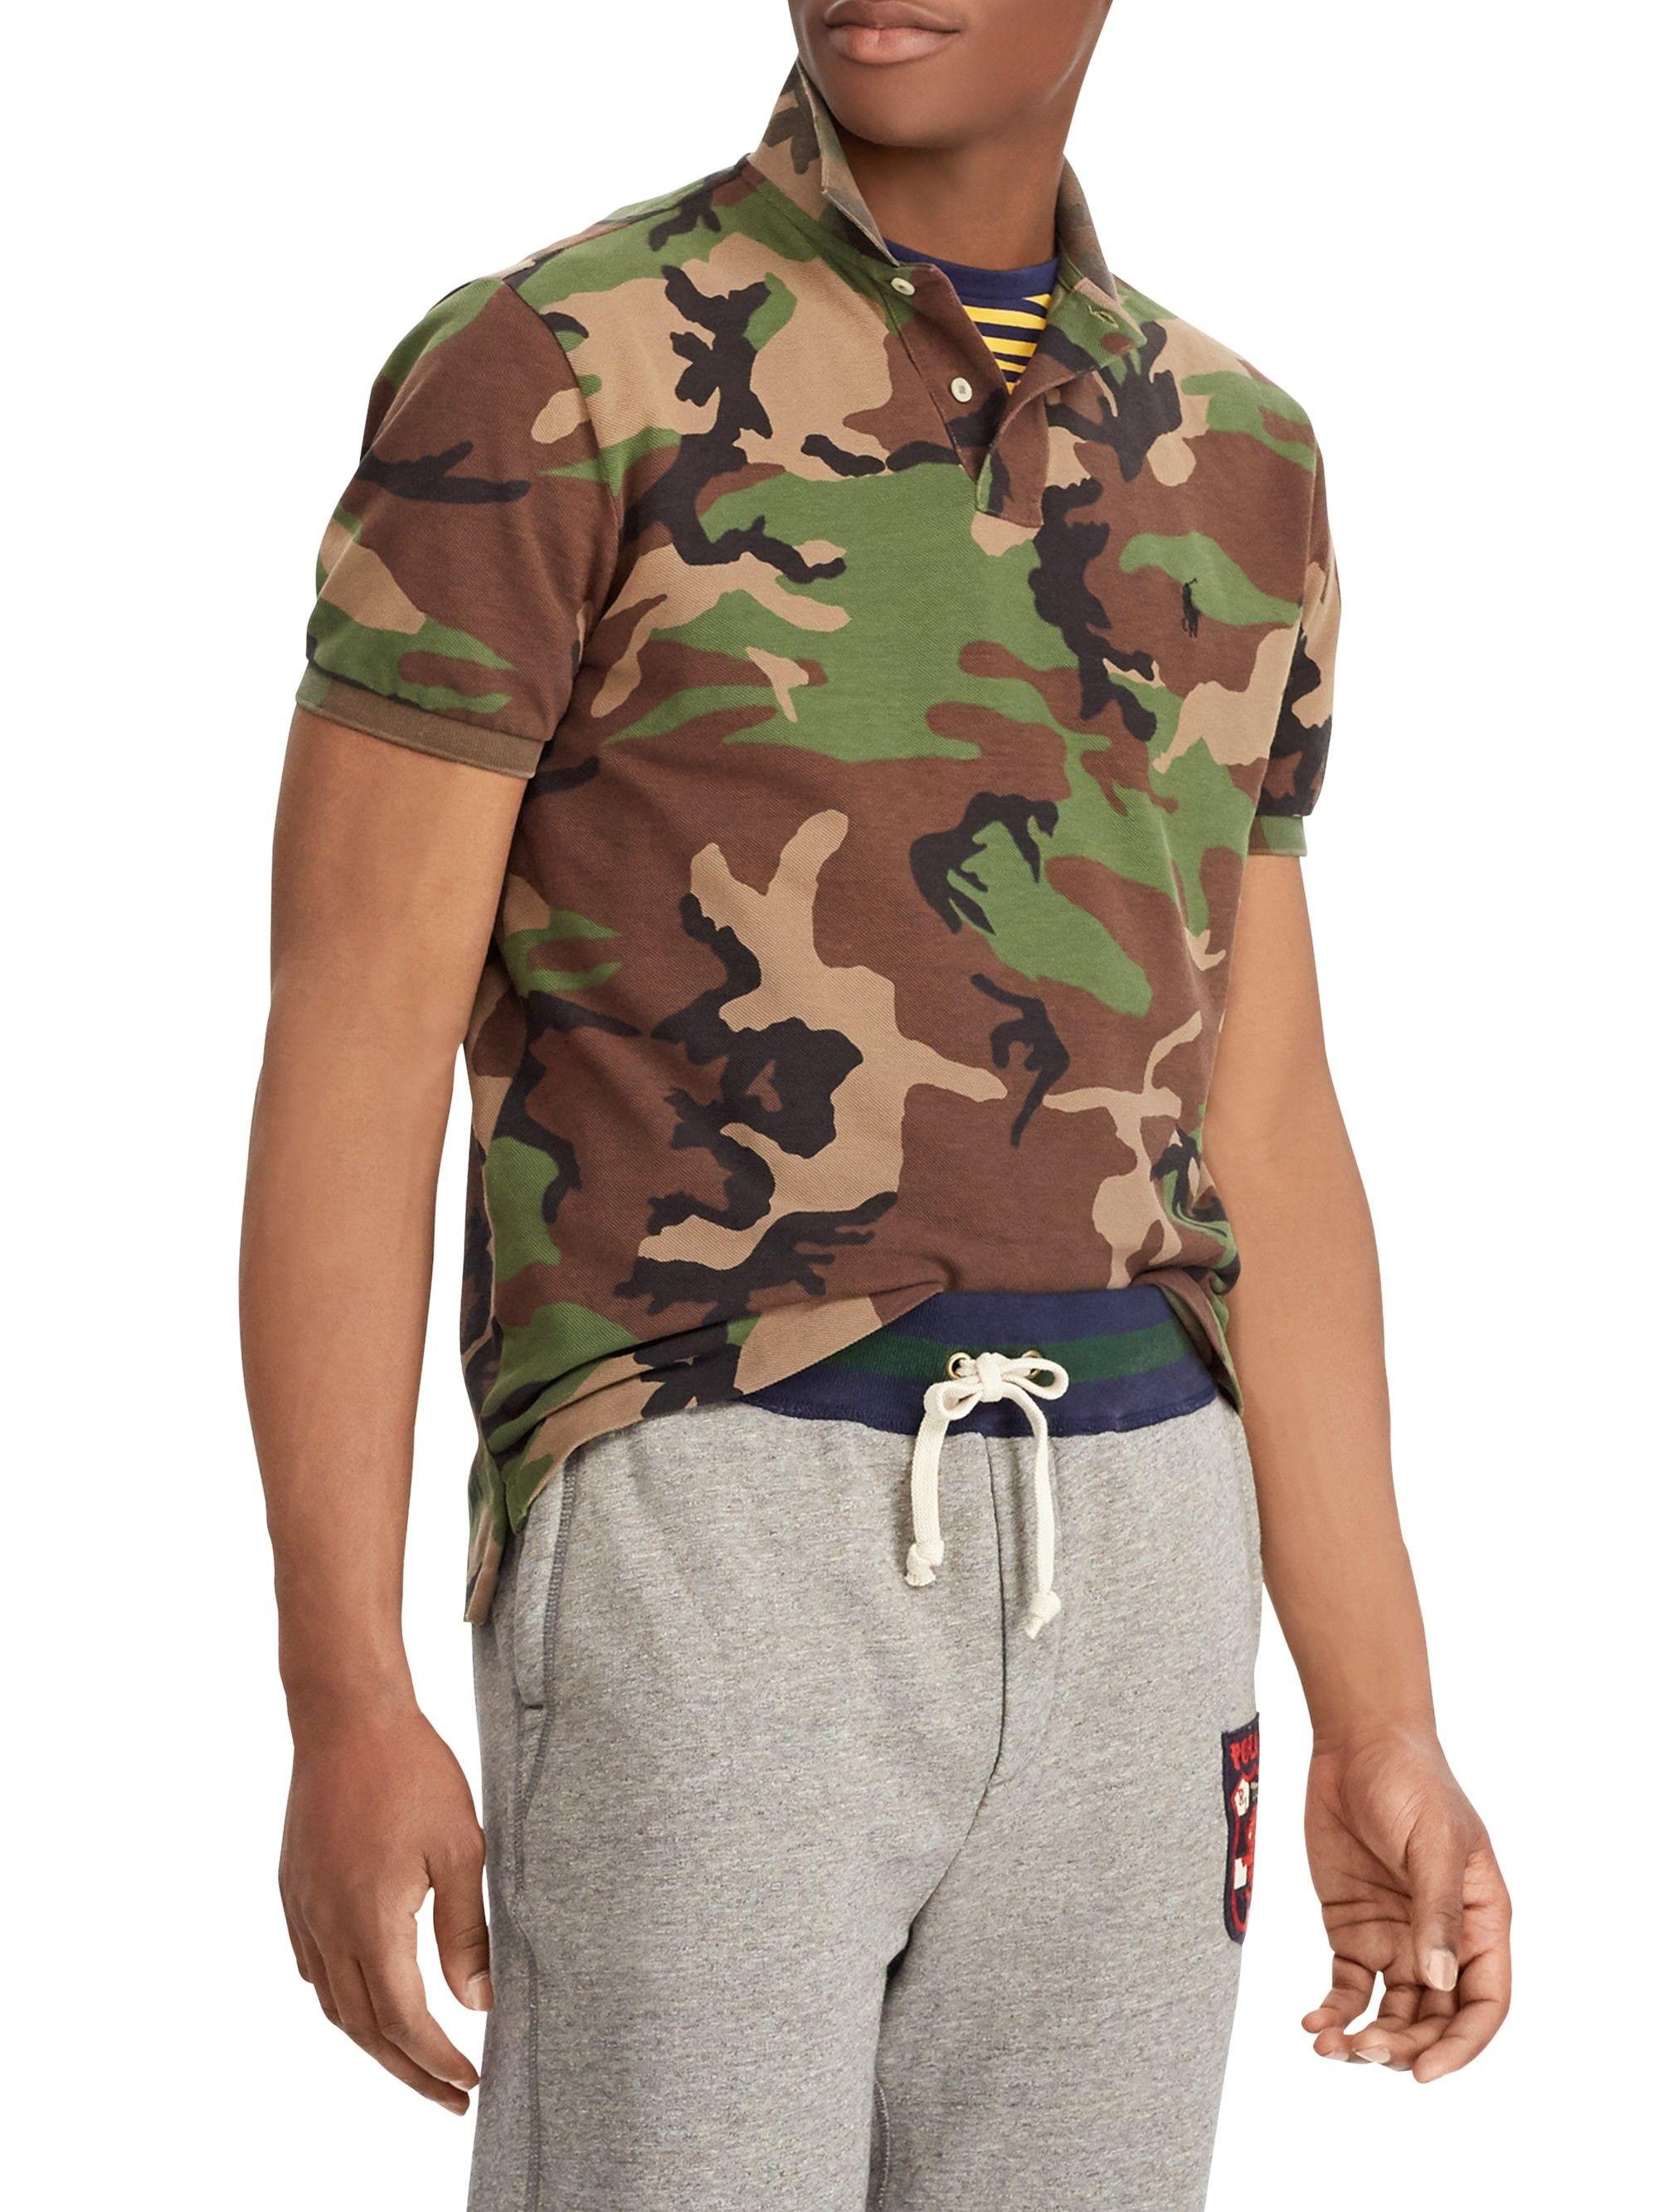 8d3a0ad22552d Ralph Lauren Custom Slim-Fit Camo Polo Shirt - Medium   Products ...